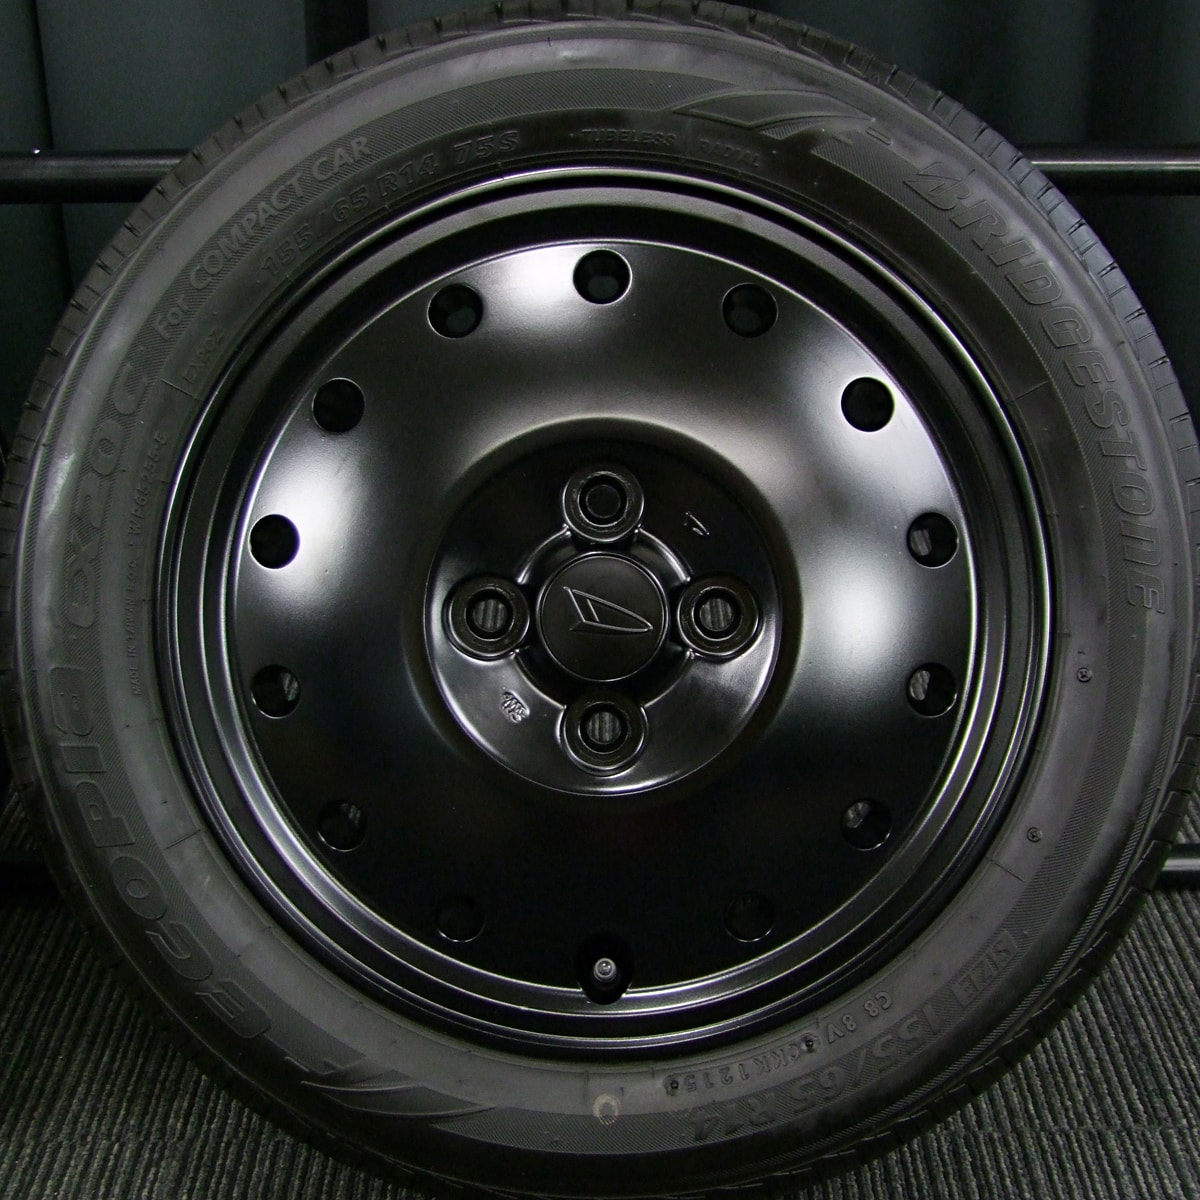 DAIHATSU ネイキッド 純正 マットブラック BRIDGESTONE ECOPIA EX20C 155/65R14 4本SET